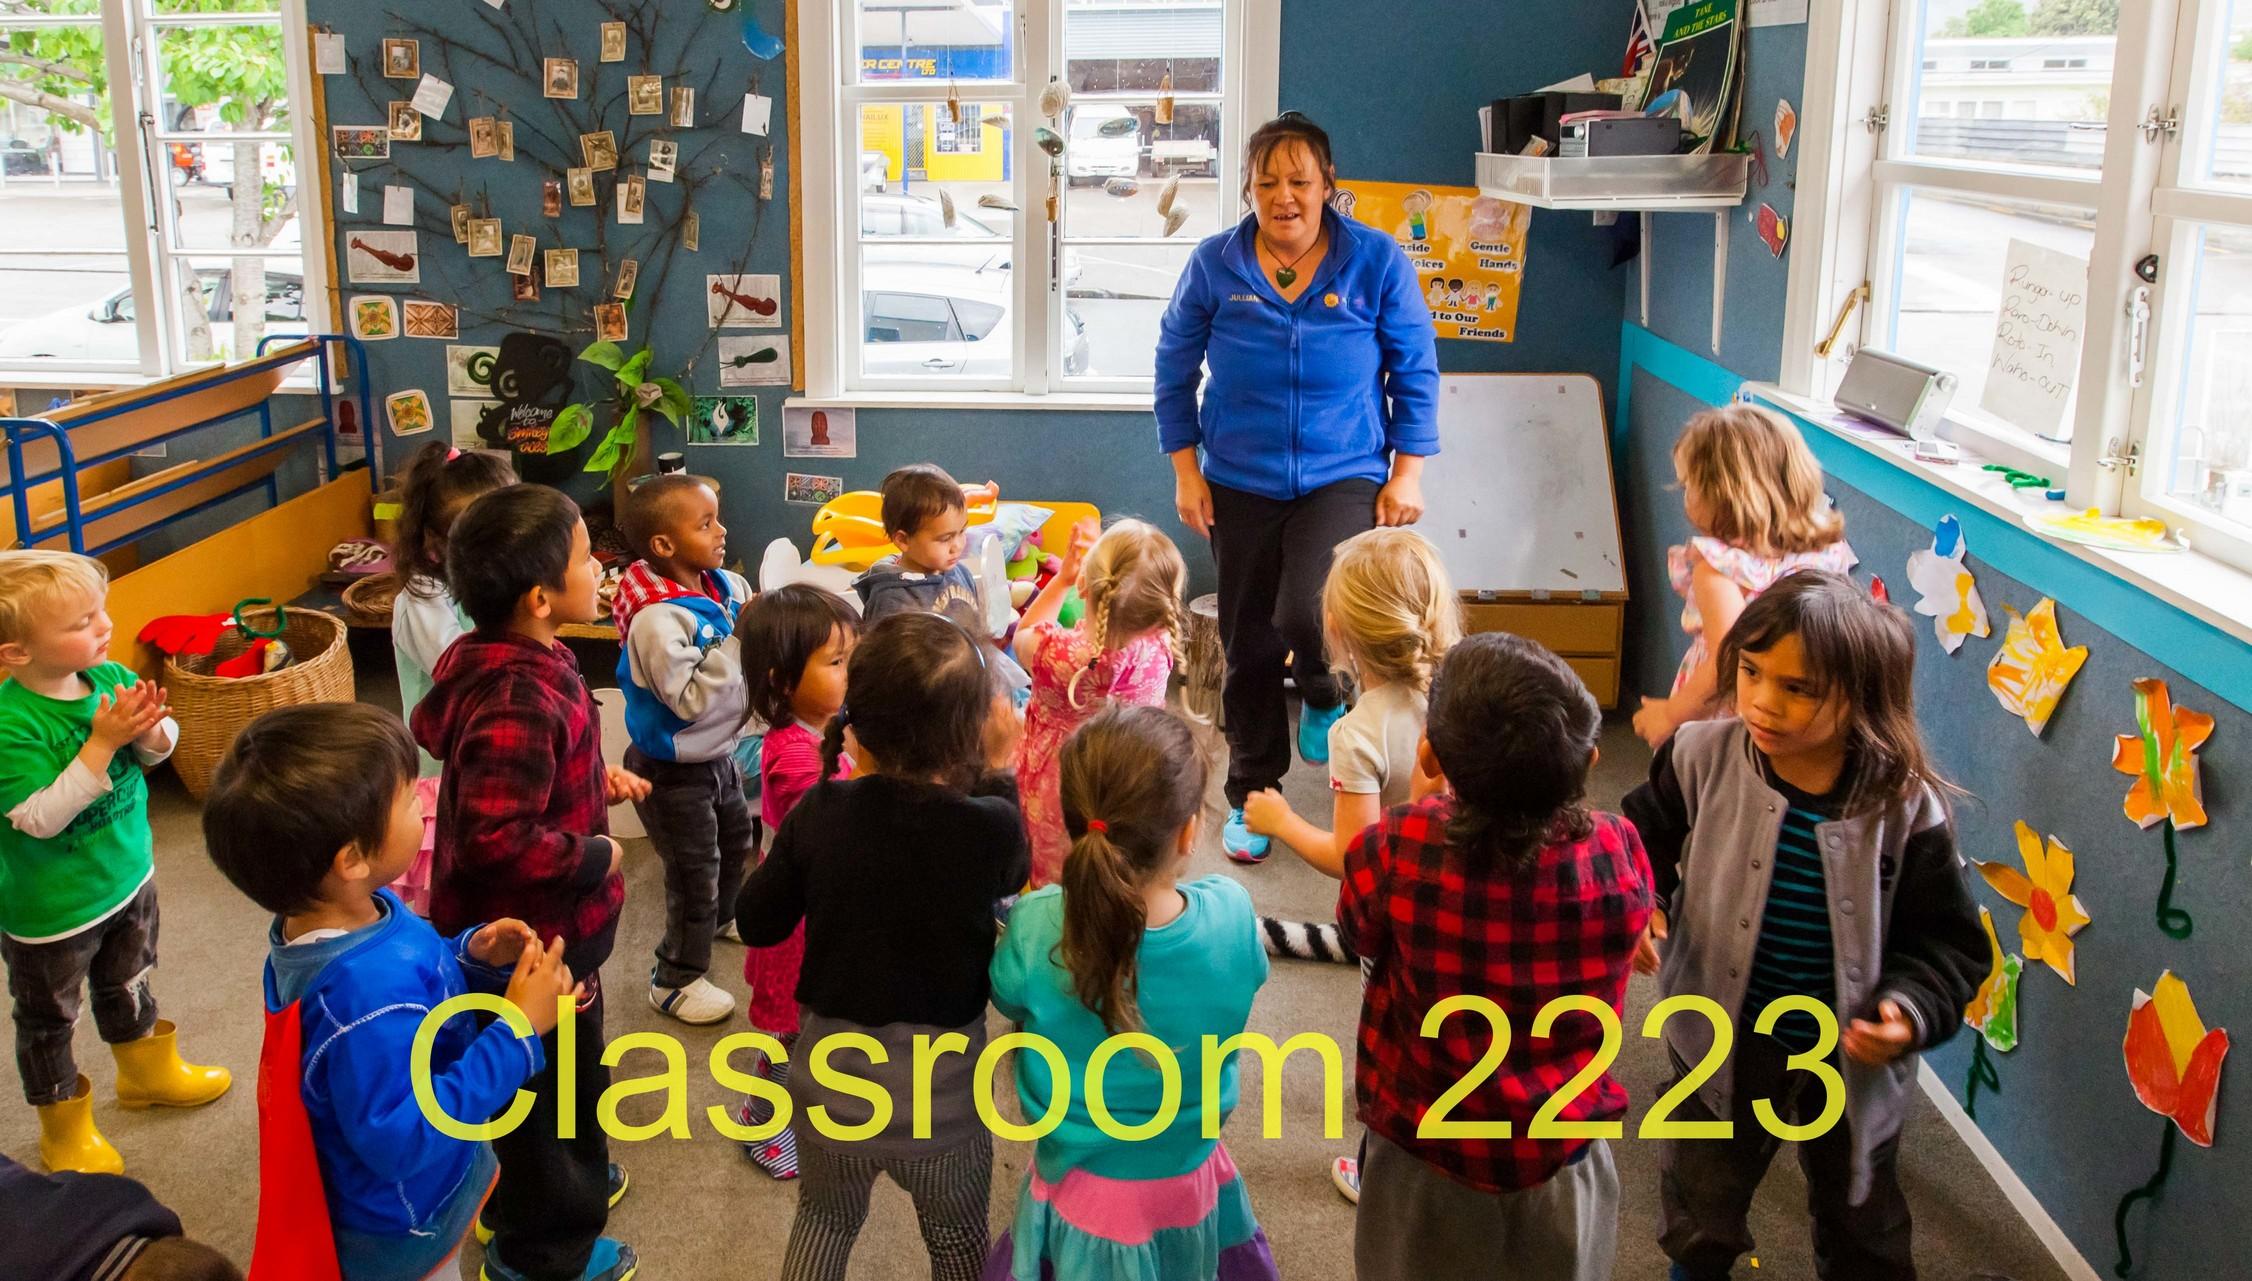 Classroom 2223